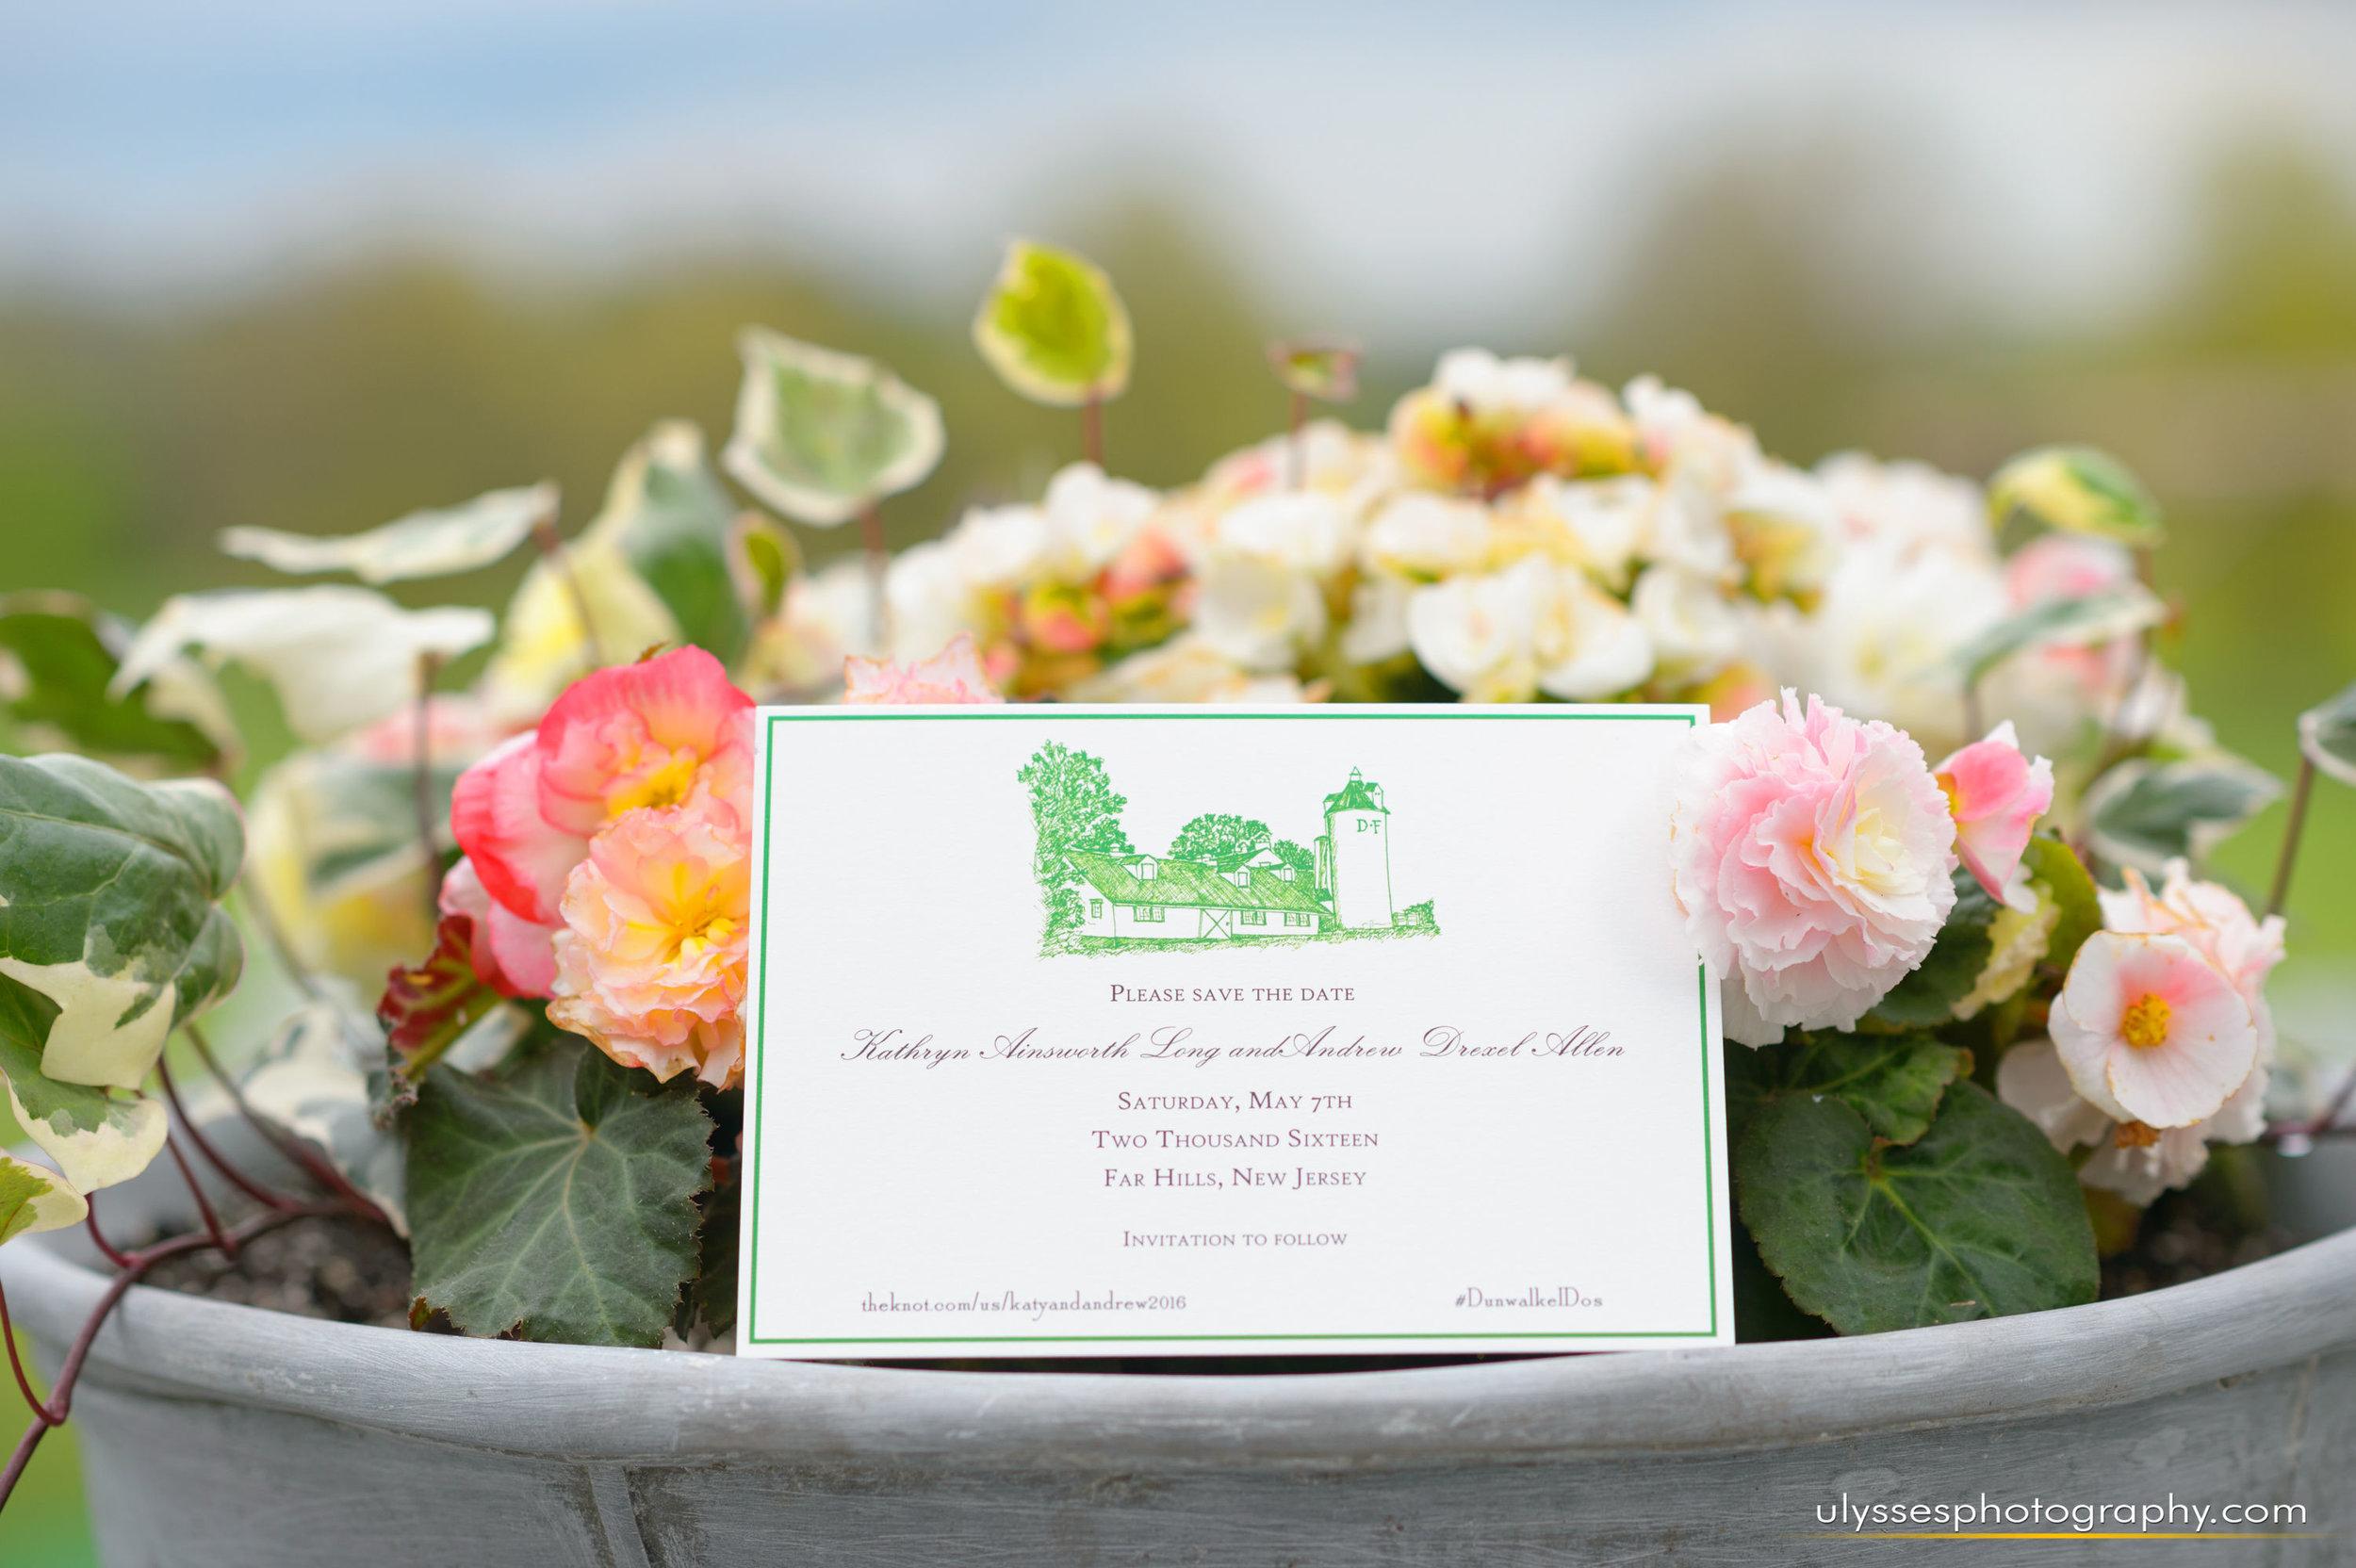 01 At Home Farm Wedding Custom Save the Date Aribella Events.jpg